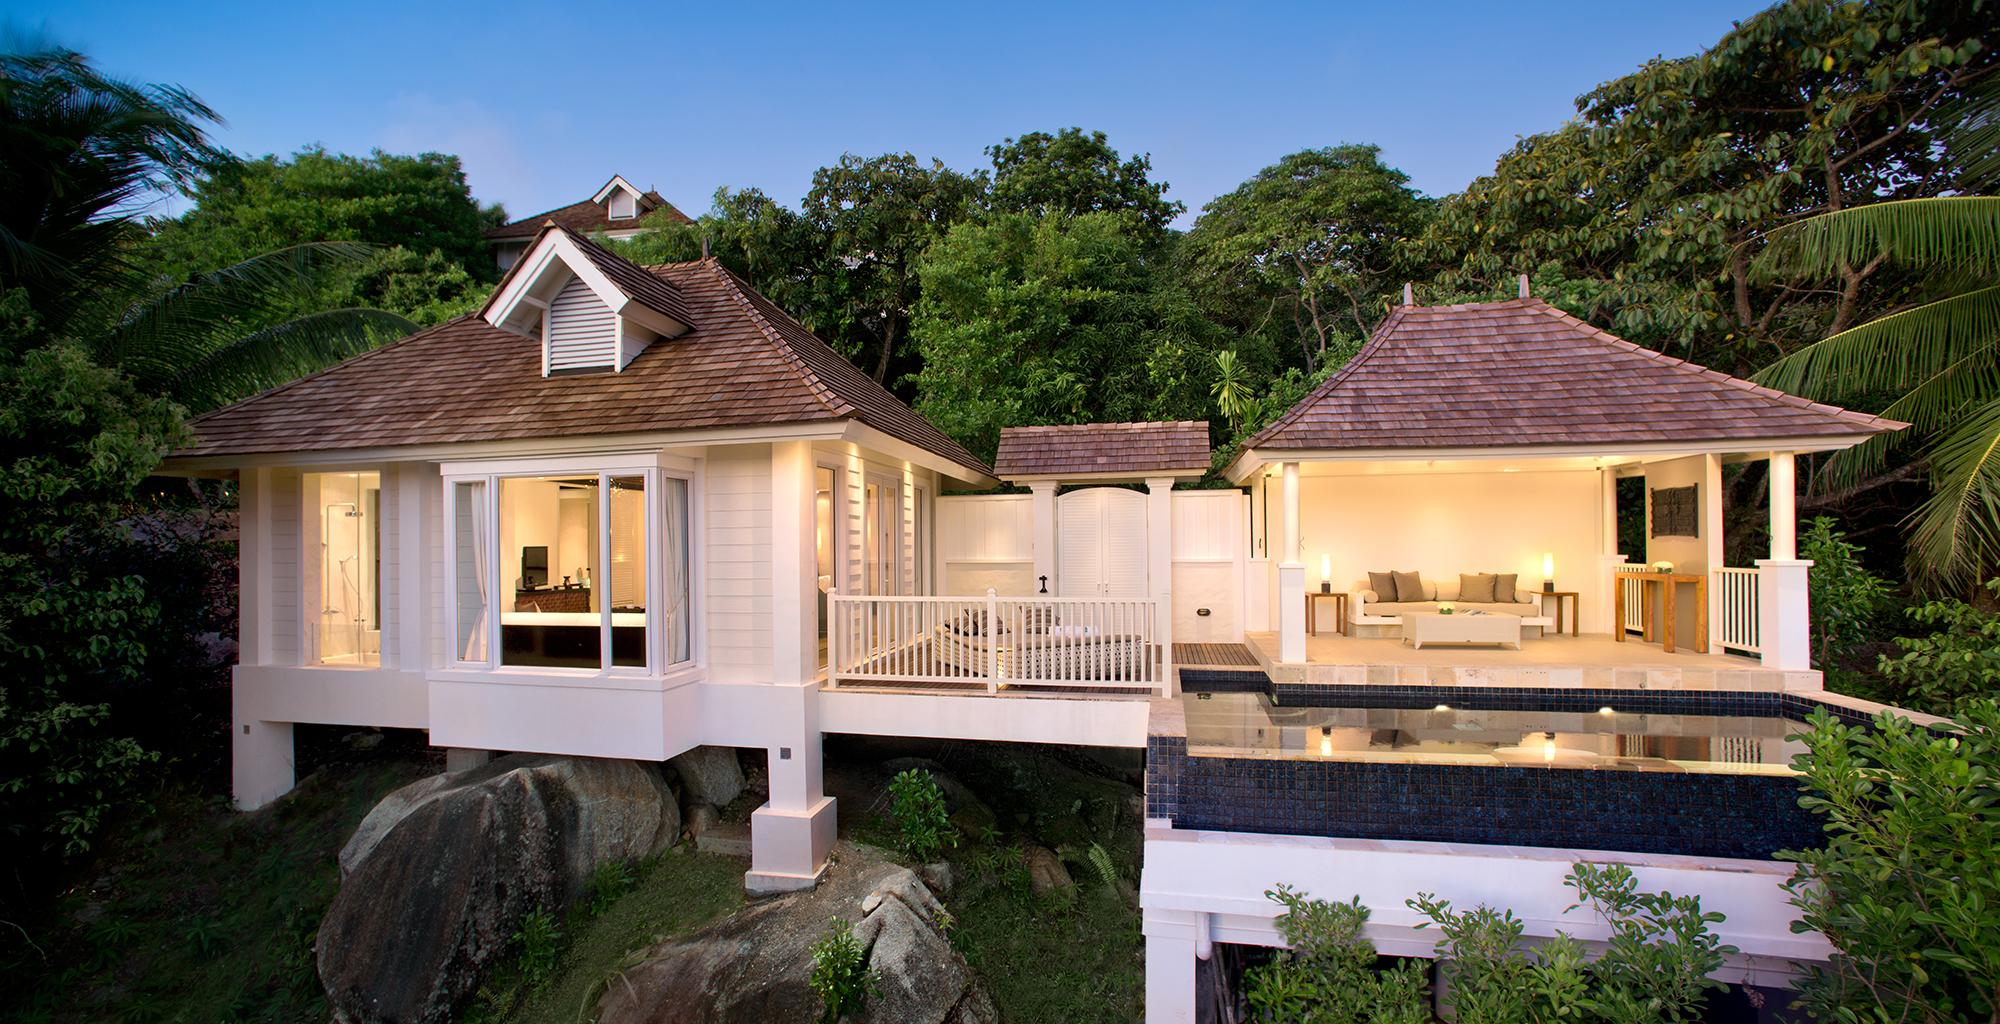 Seychelles-Banyan-Tree-Hotel-Exterior